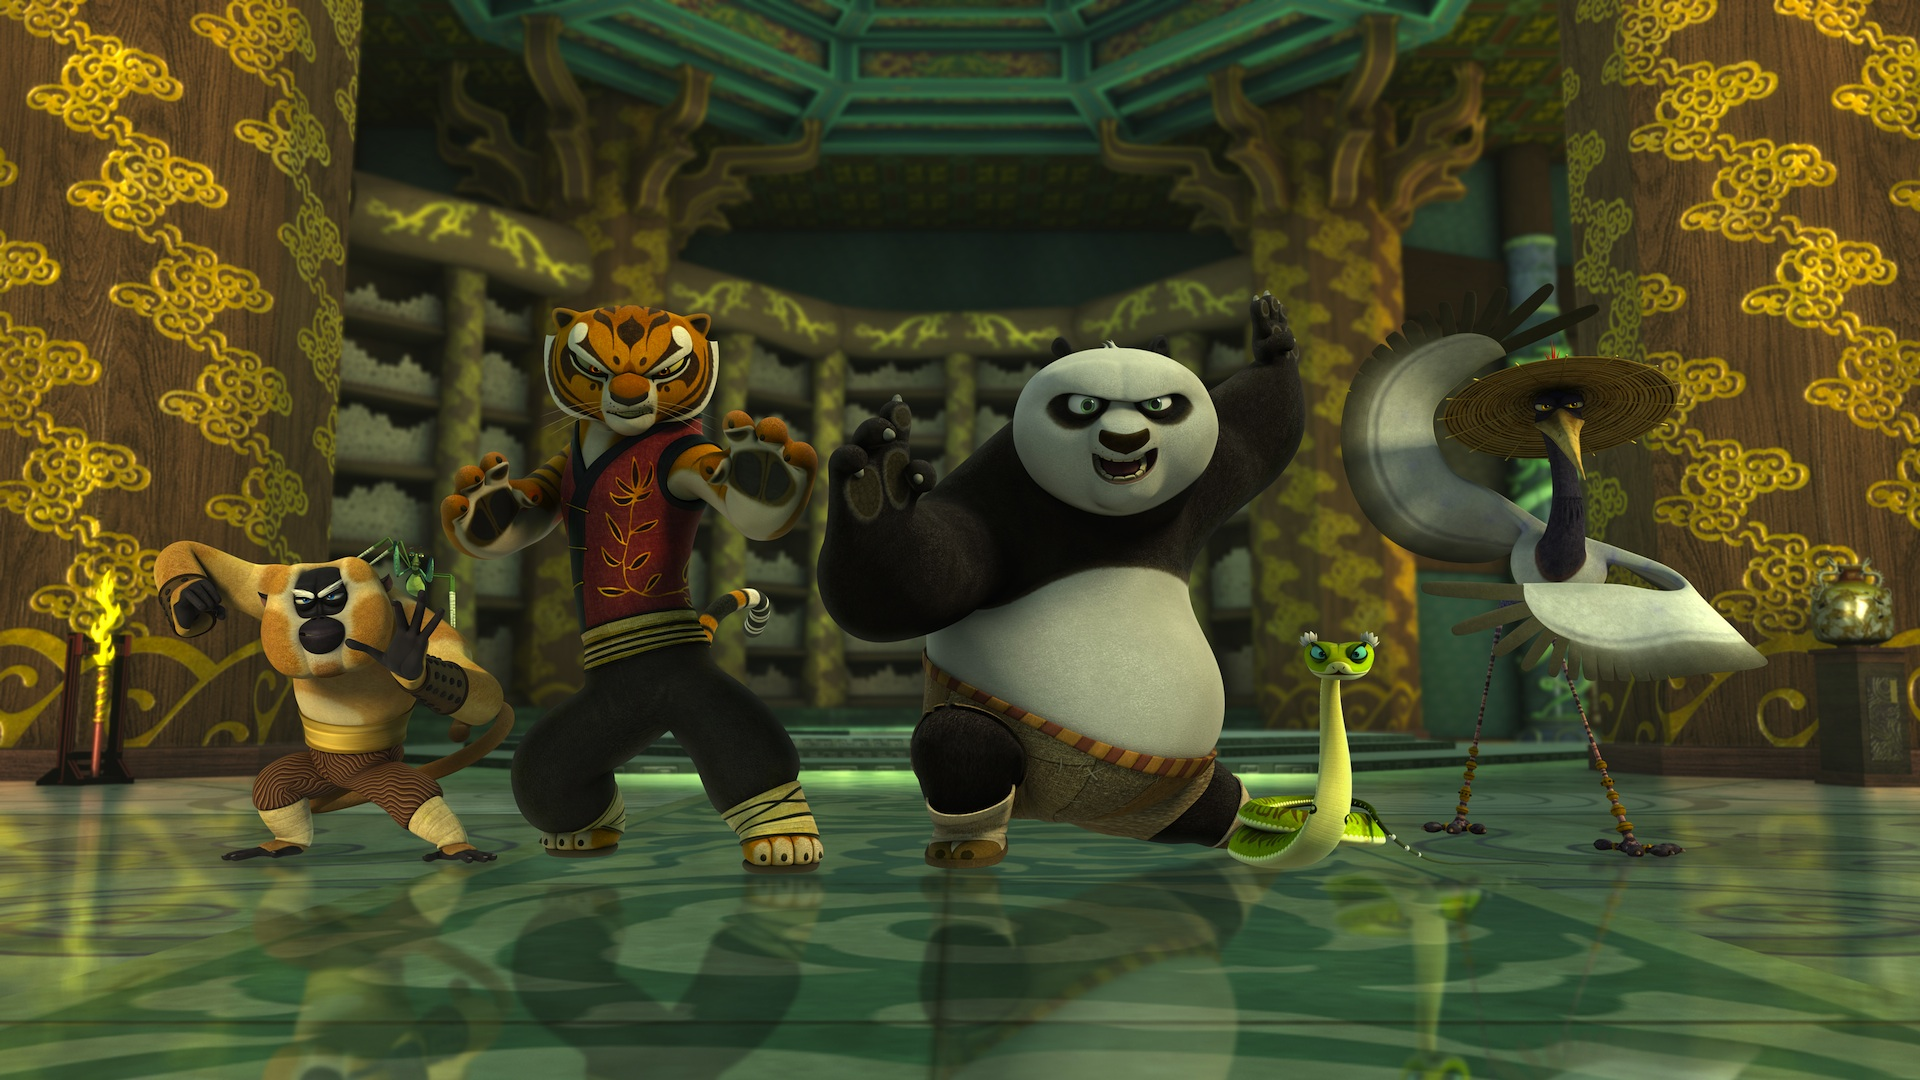 Brubeck кунгфу панда легенды 3 сезон того, хорошем белье